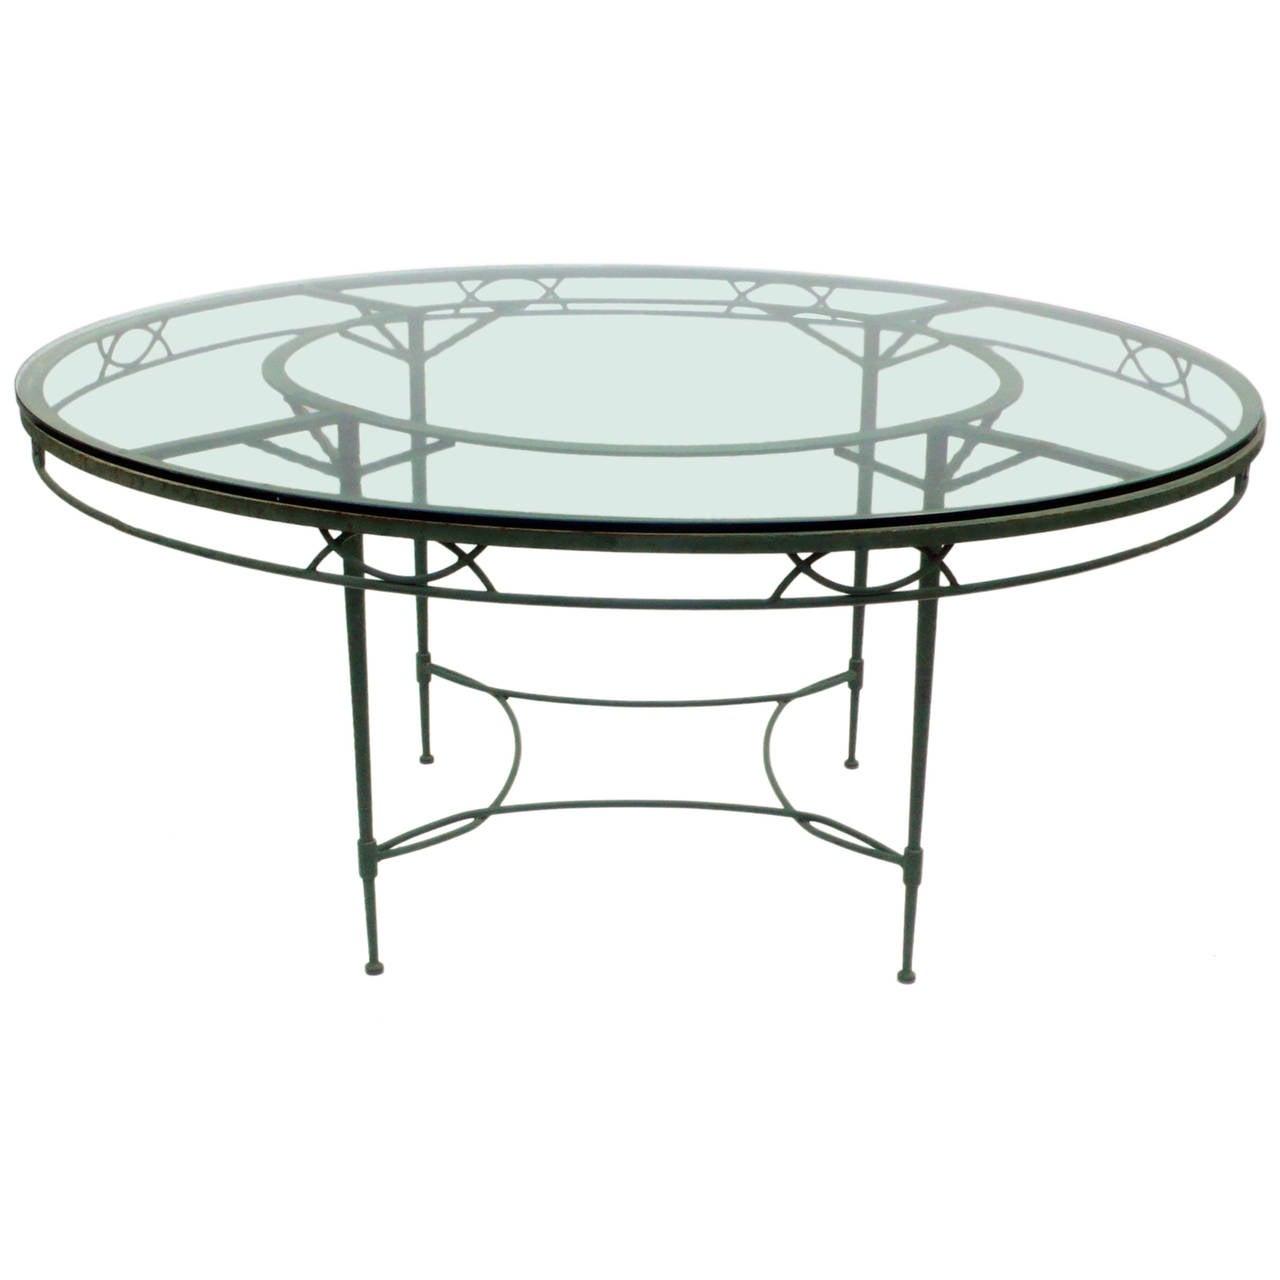 patio table seats 8 darlee santa 9 cast aluminum. Black Bedroom Furniture Sets. Home Design Ideas